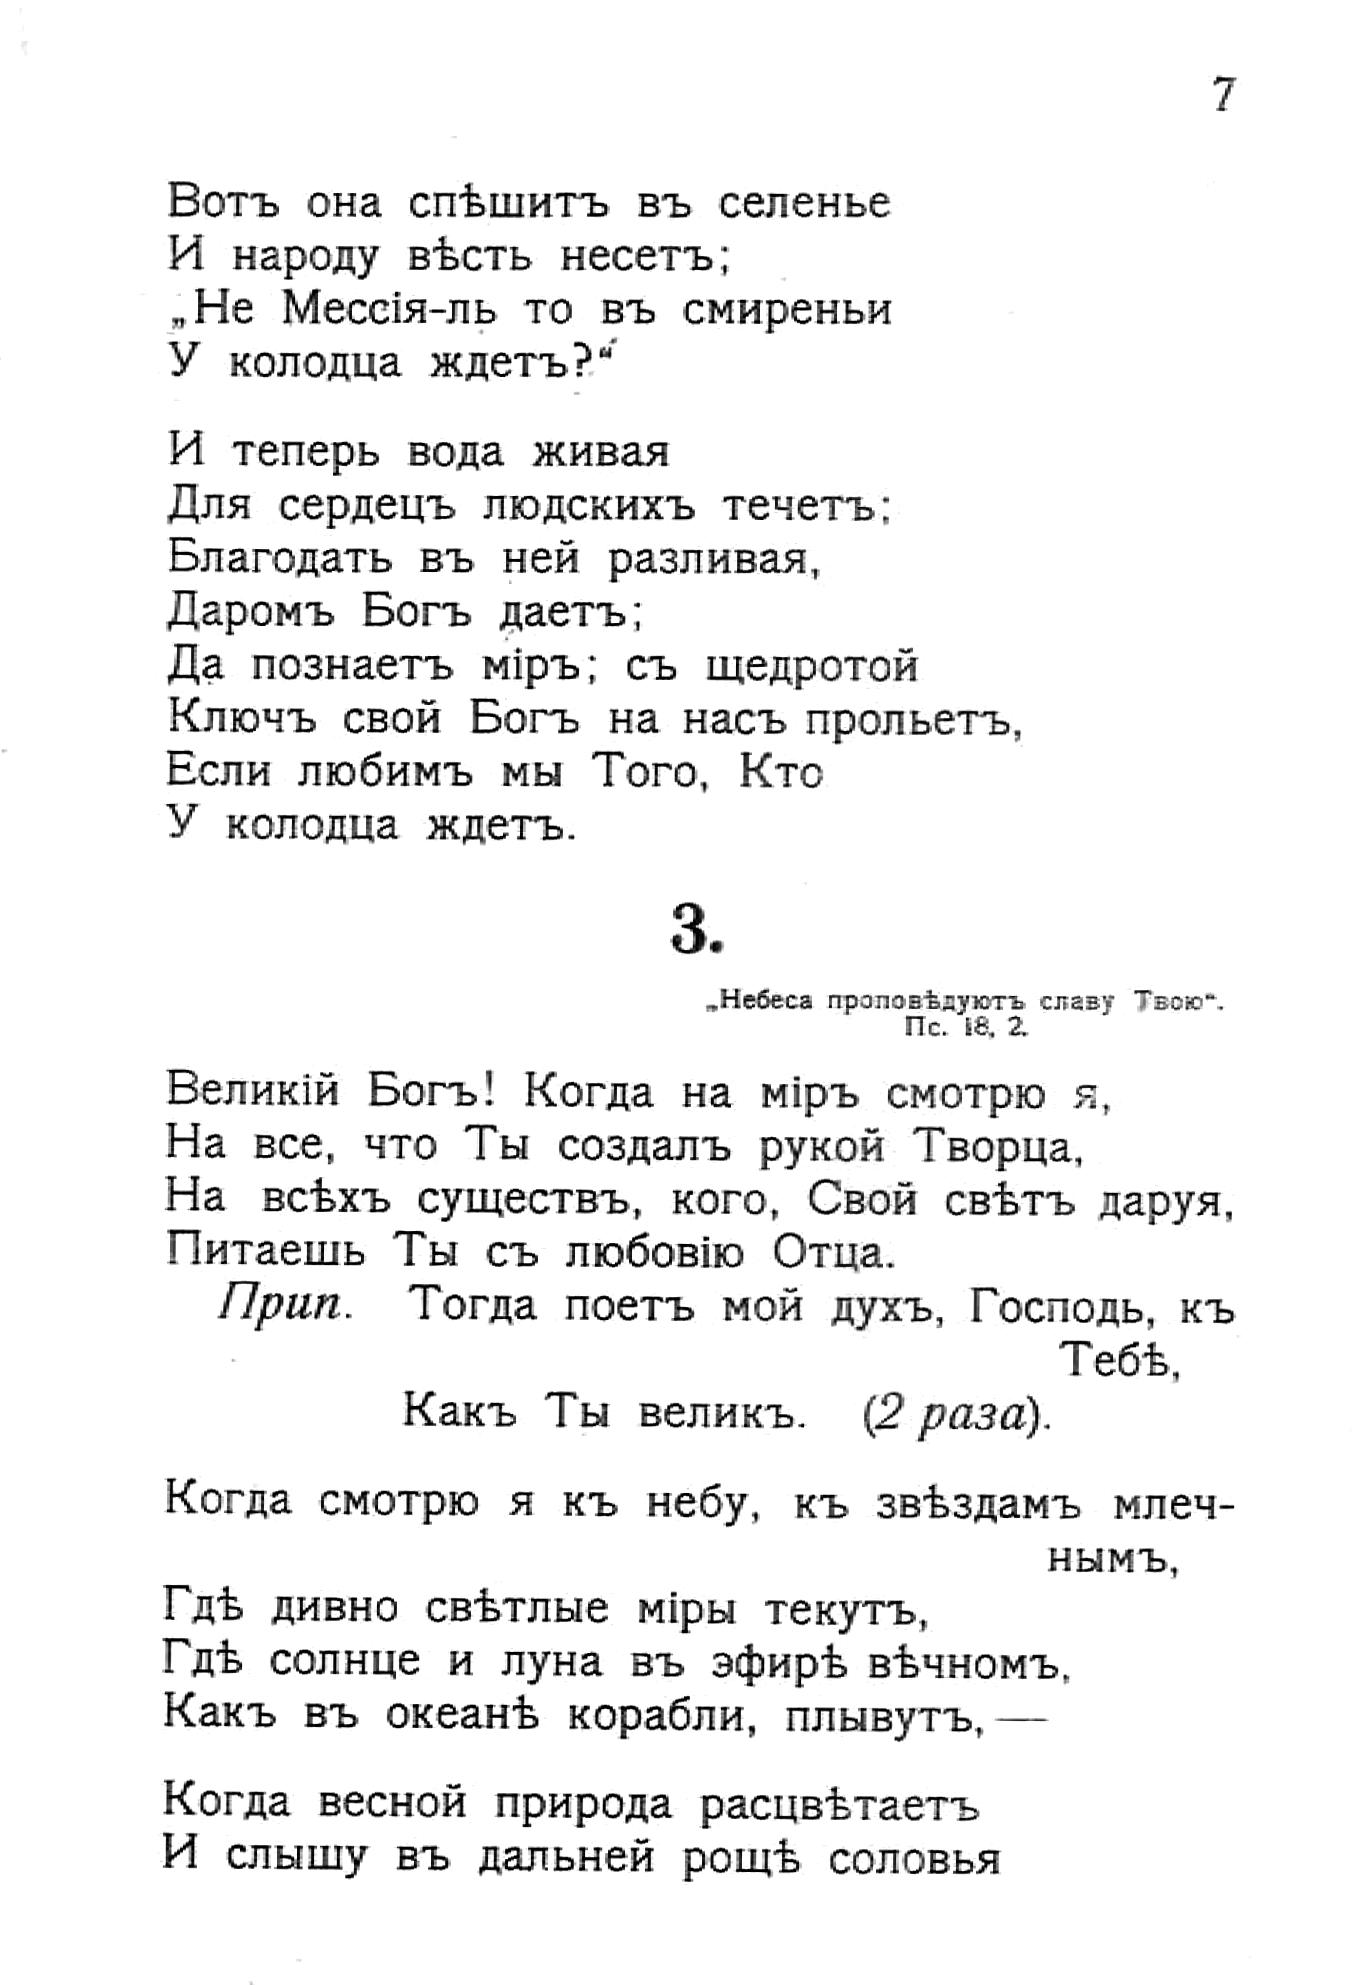 801_r-1_Prokhanov1908-2.png